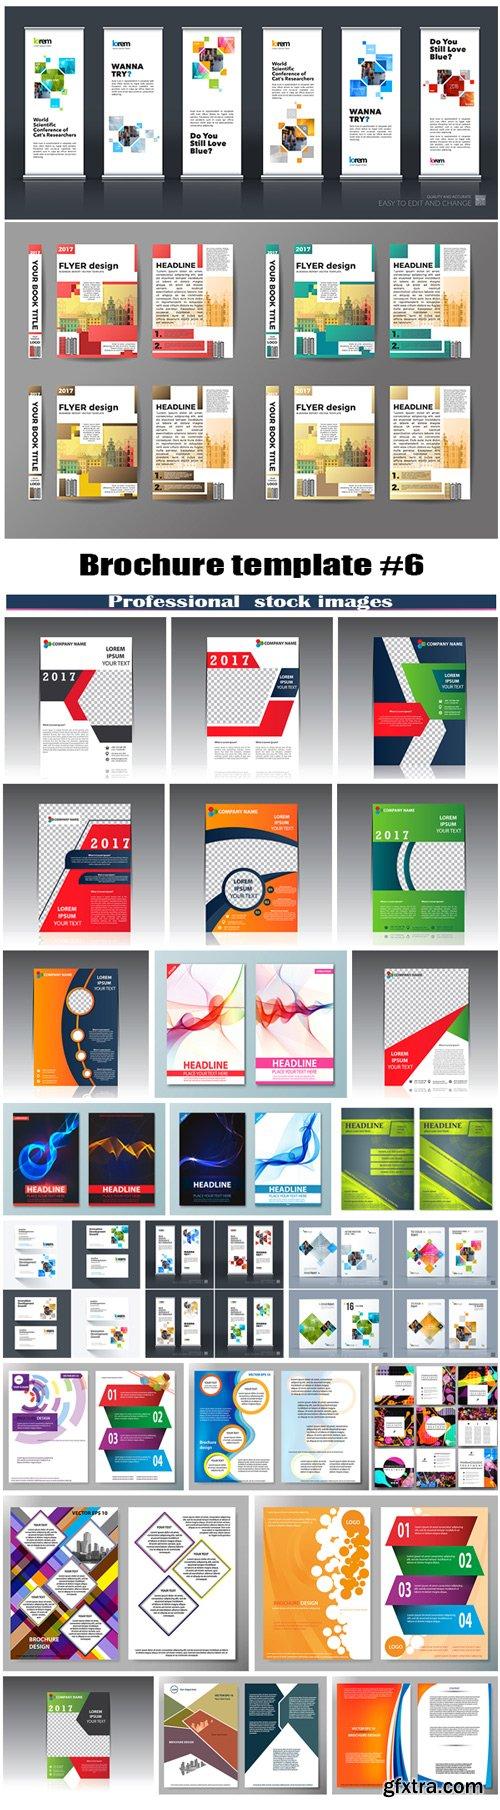 Brochure template set #6